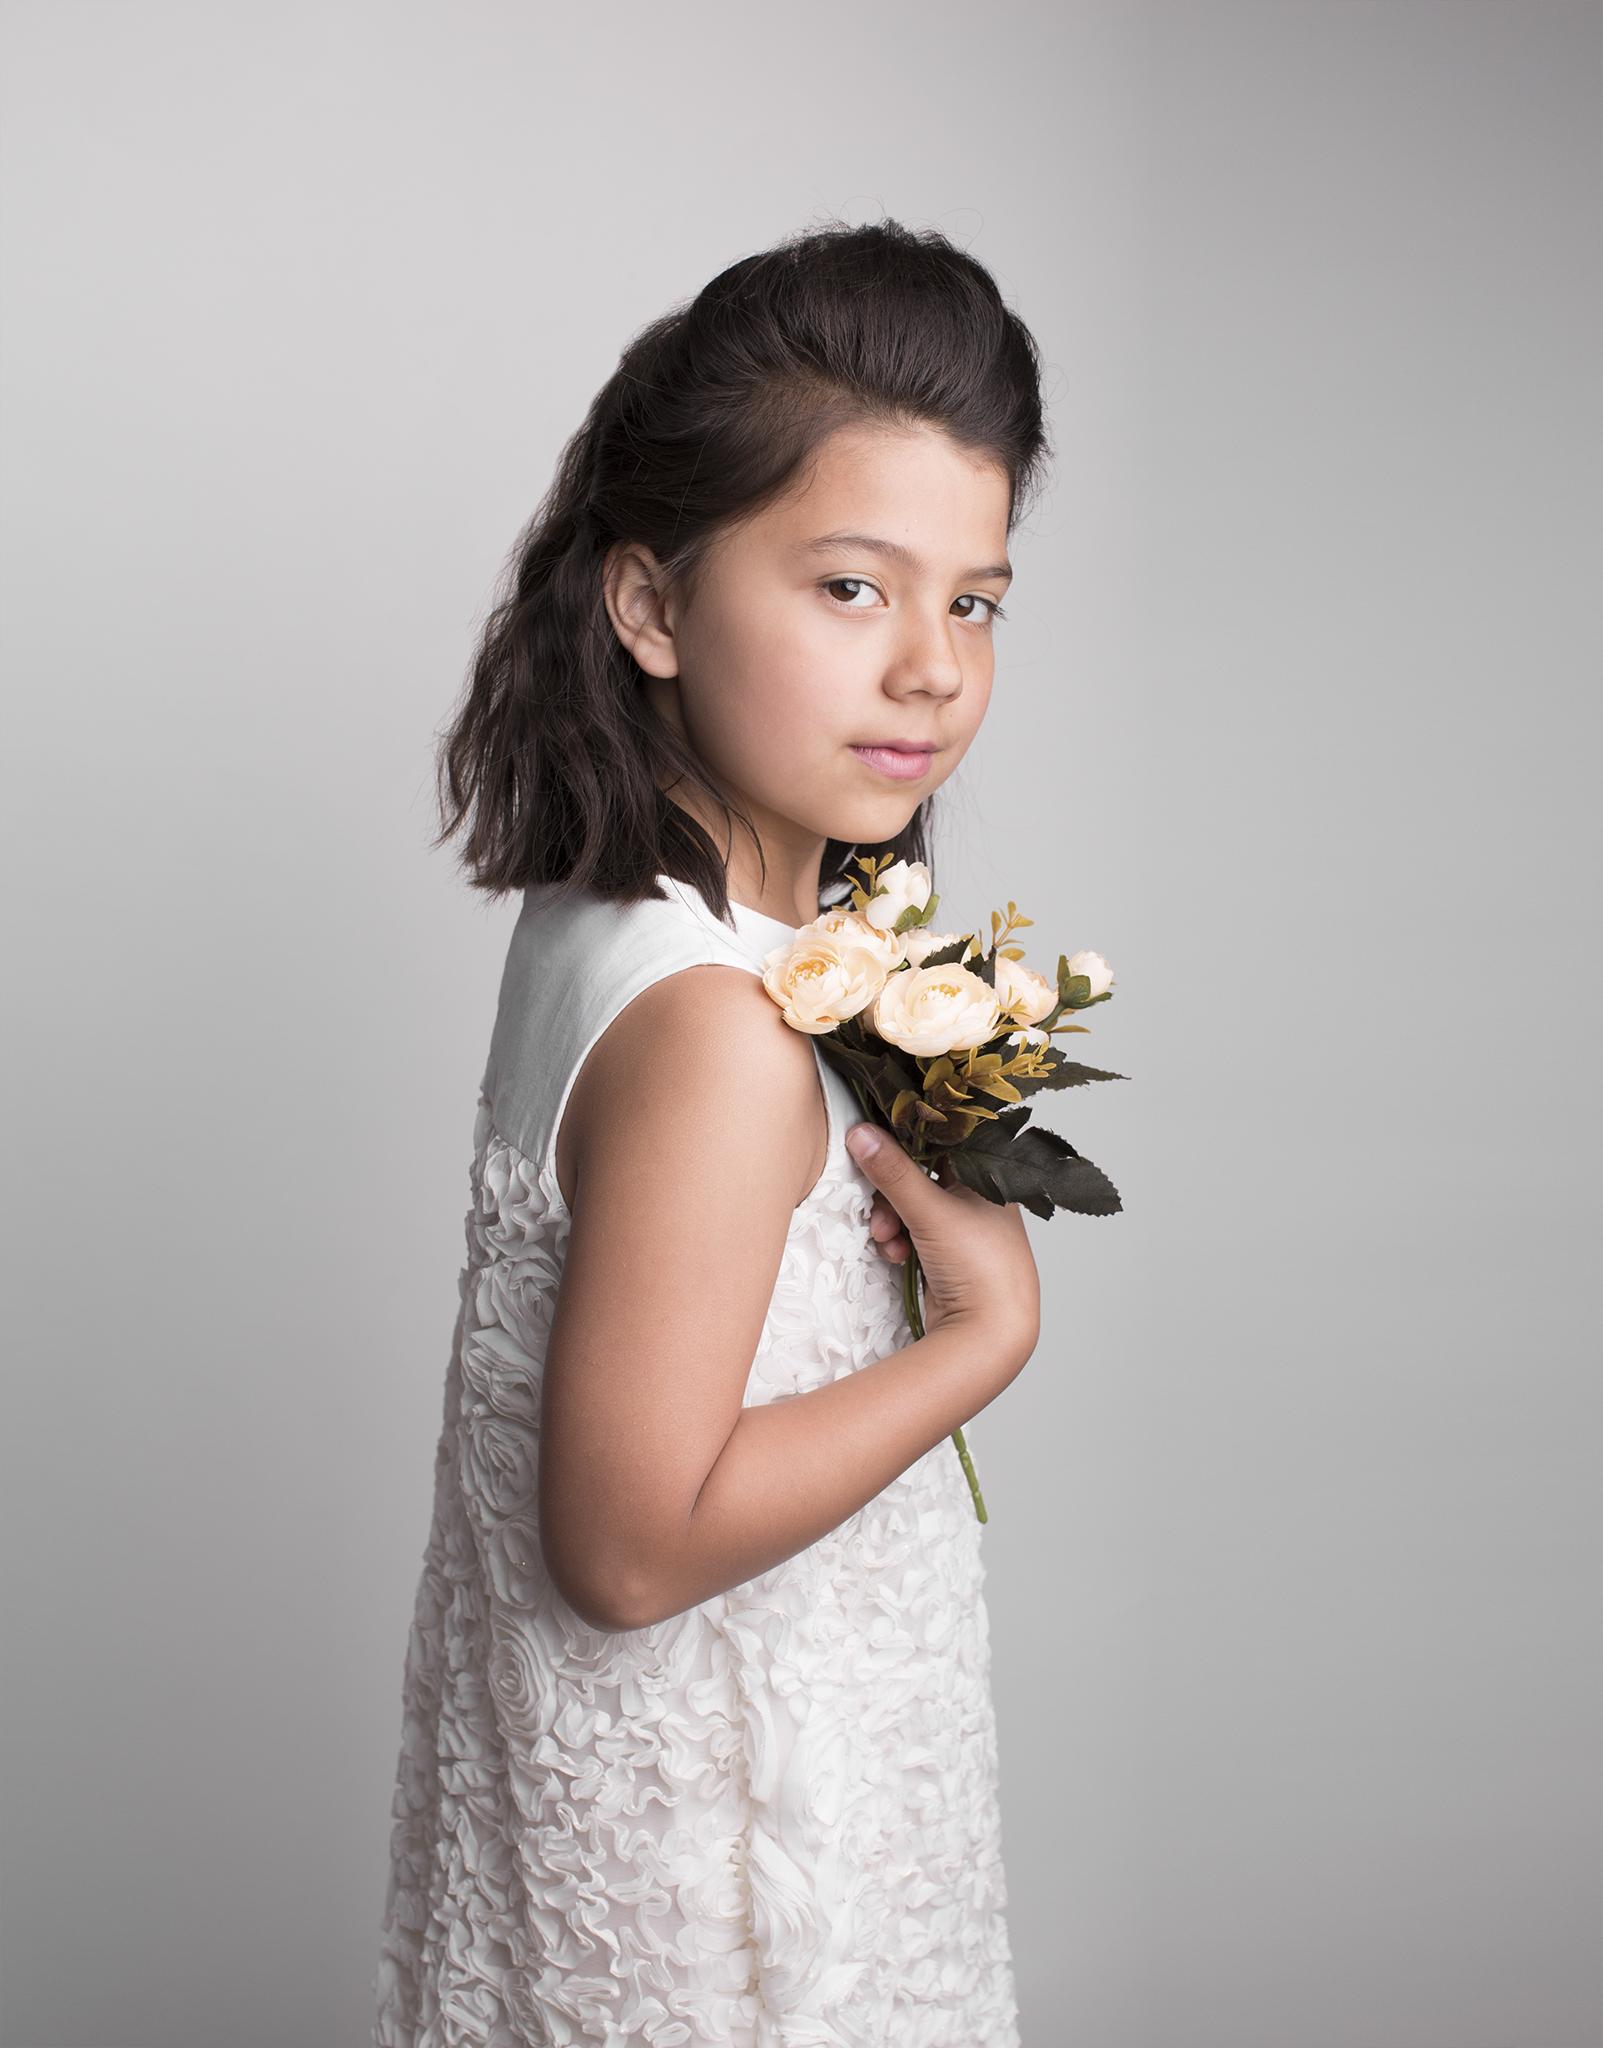 elizabethgphotography_fineart_kingslangley_hertfordshire_jafa_family_portrait_006.jpg